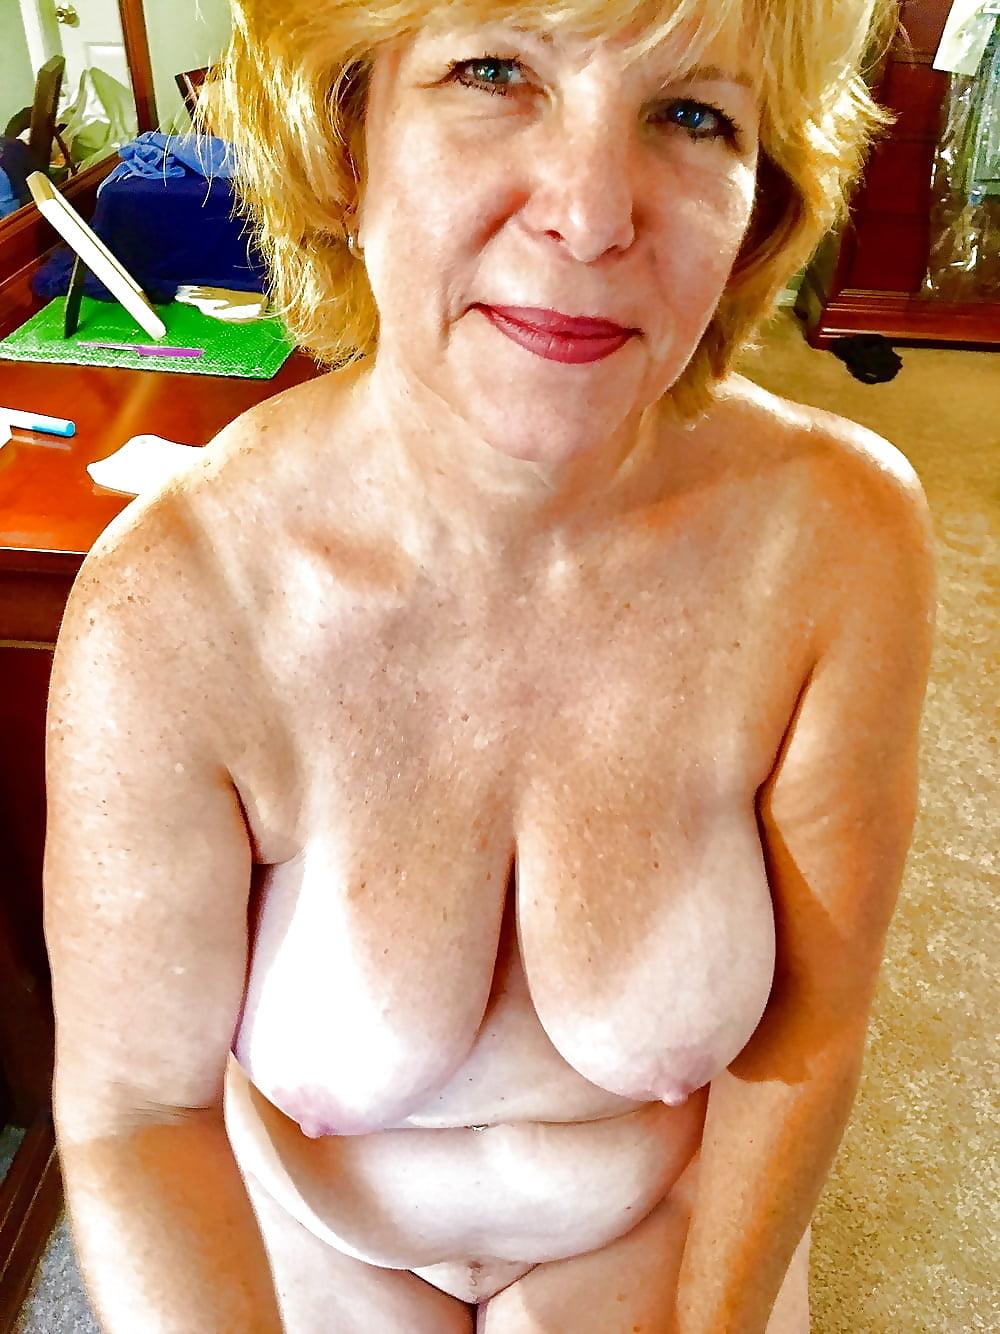 Old naked ladies tumblr-1001